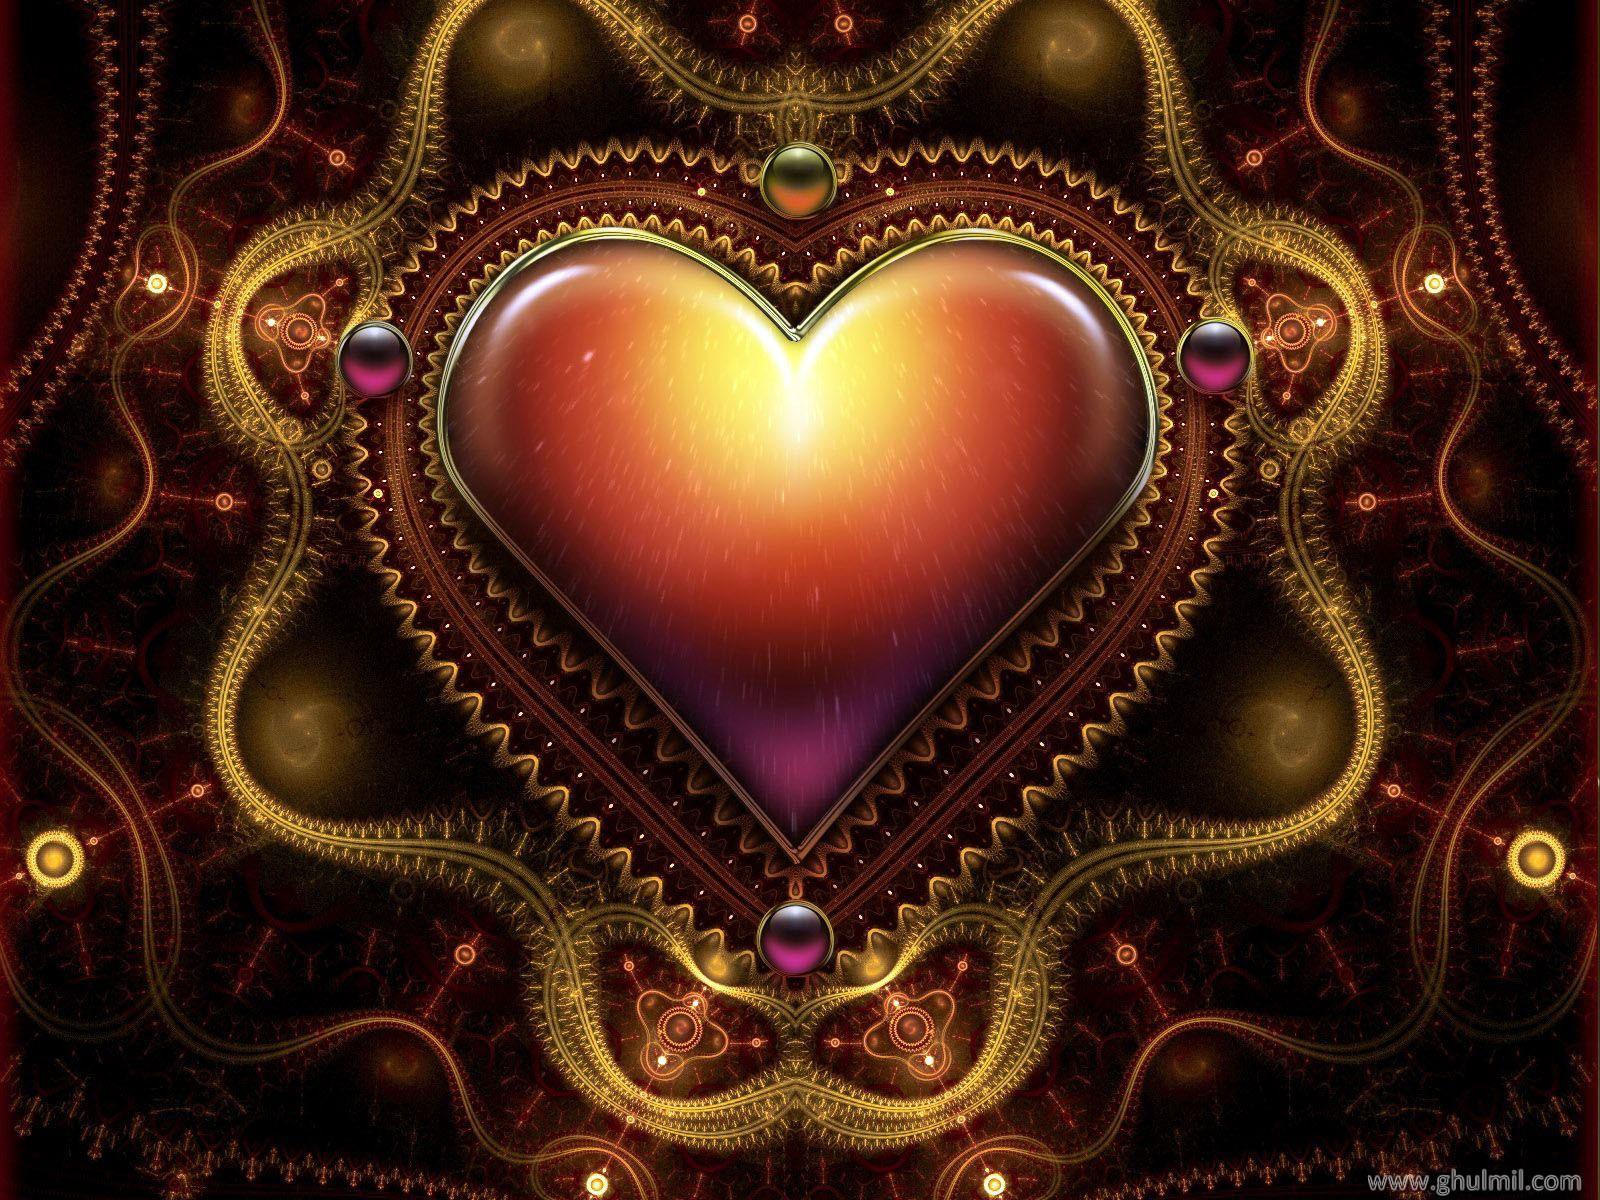 Beautiful 3d Hd Heart Mobile Wallpaper En gzel masast hd favori 1600x1200